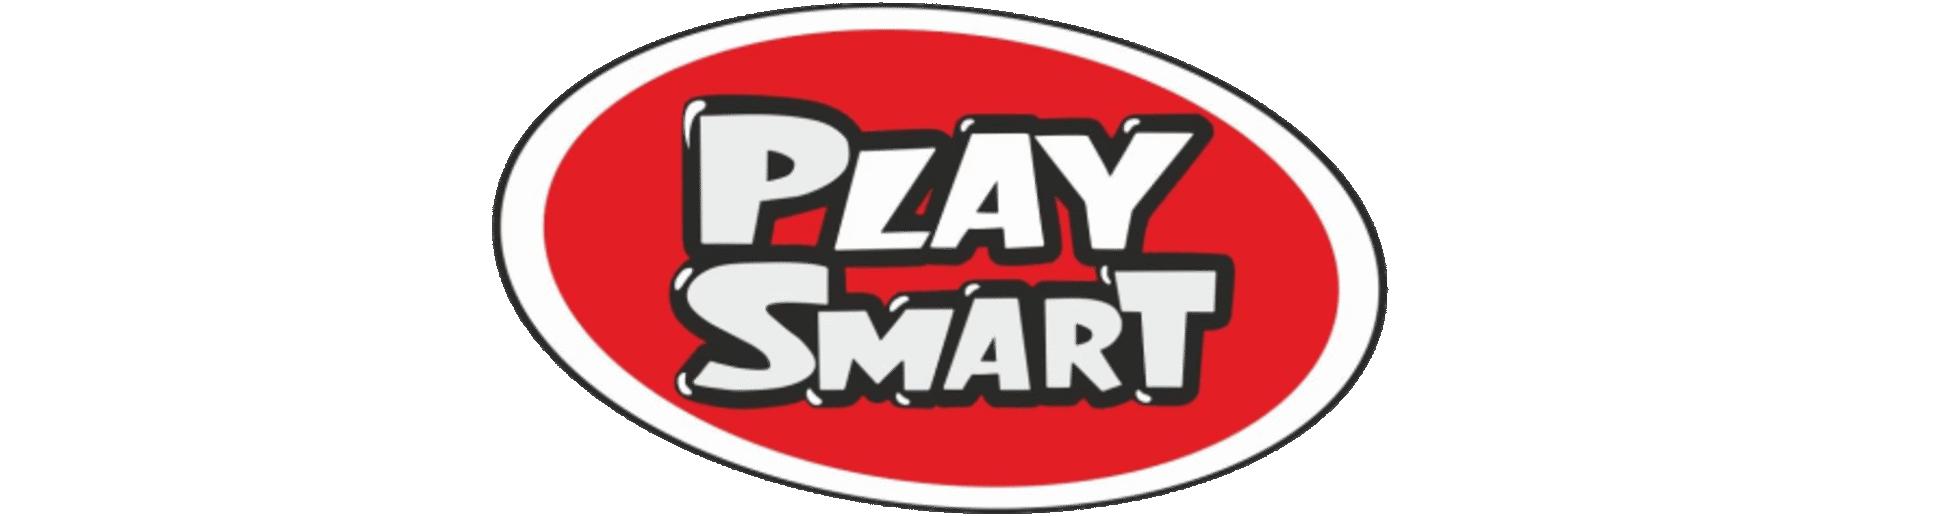 Игрушки Play Smart в PlushevoToys